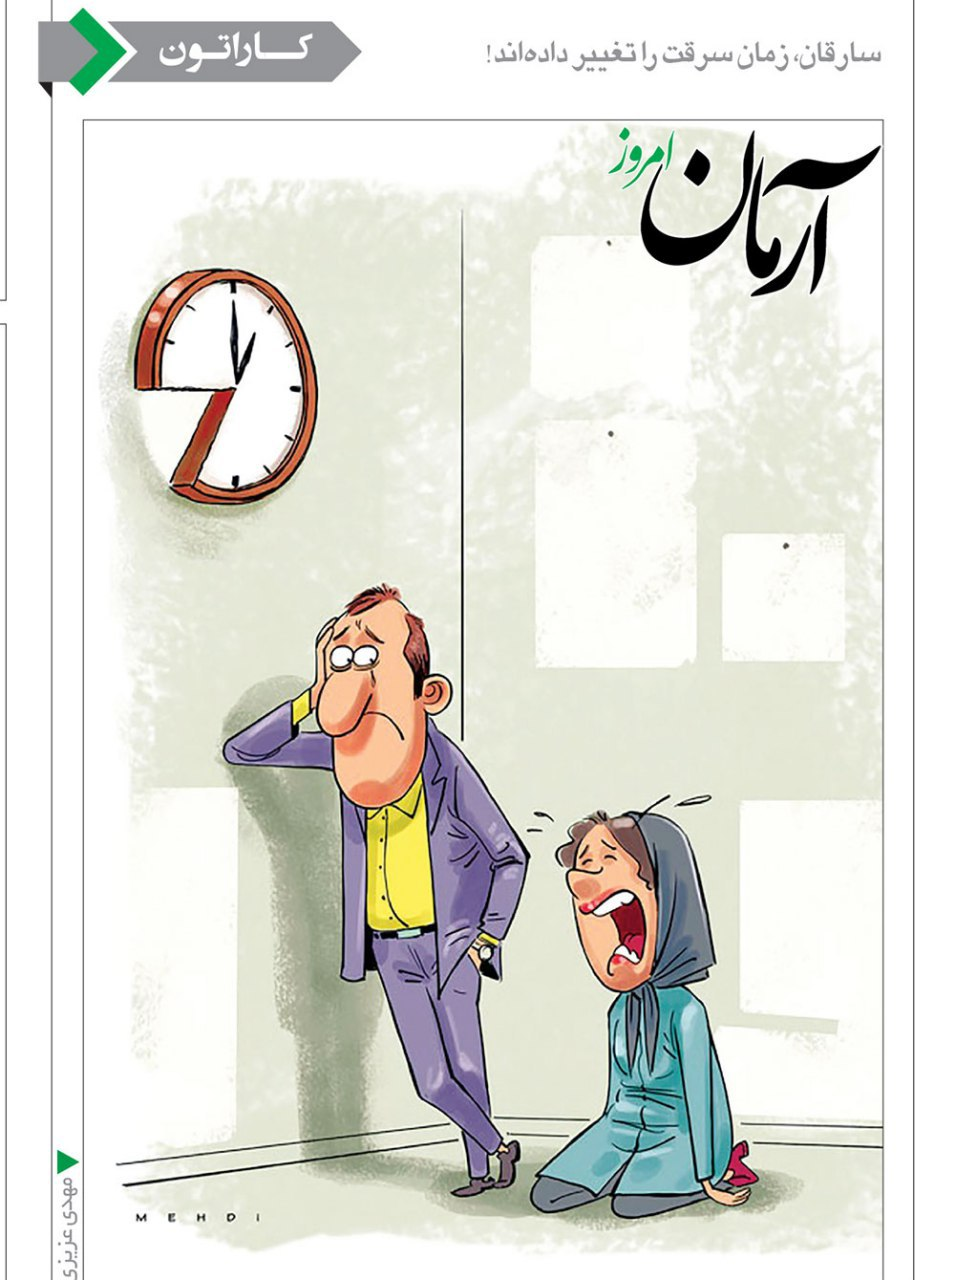 تغییر ساعت سرقت منازل! /کاریکاتور